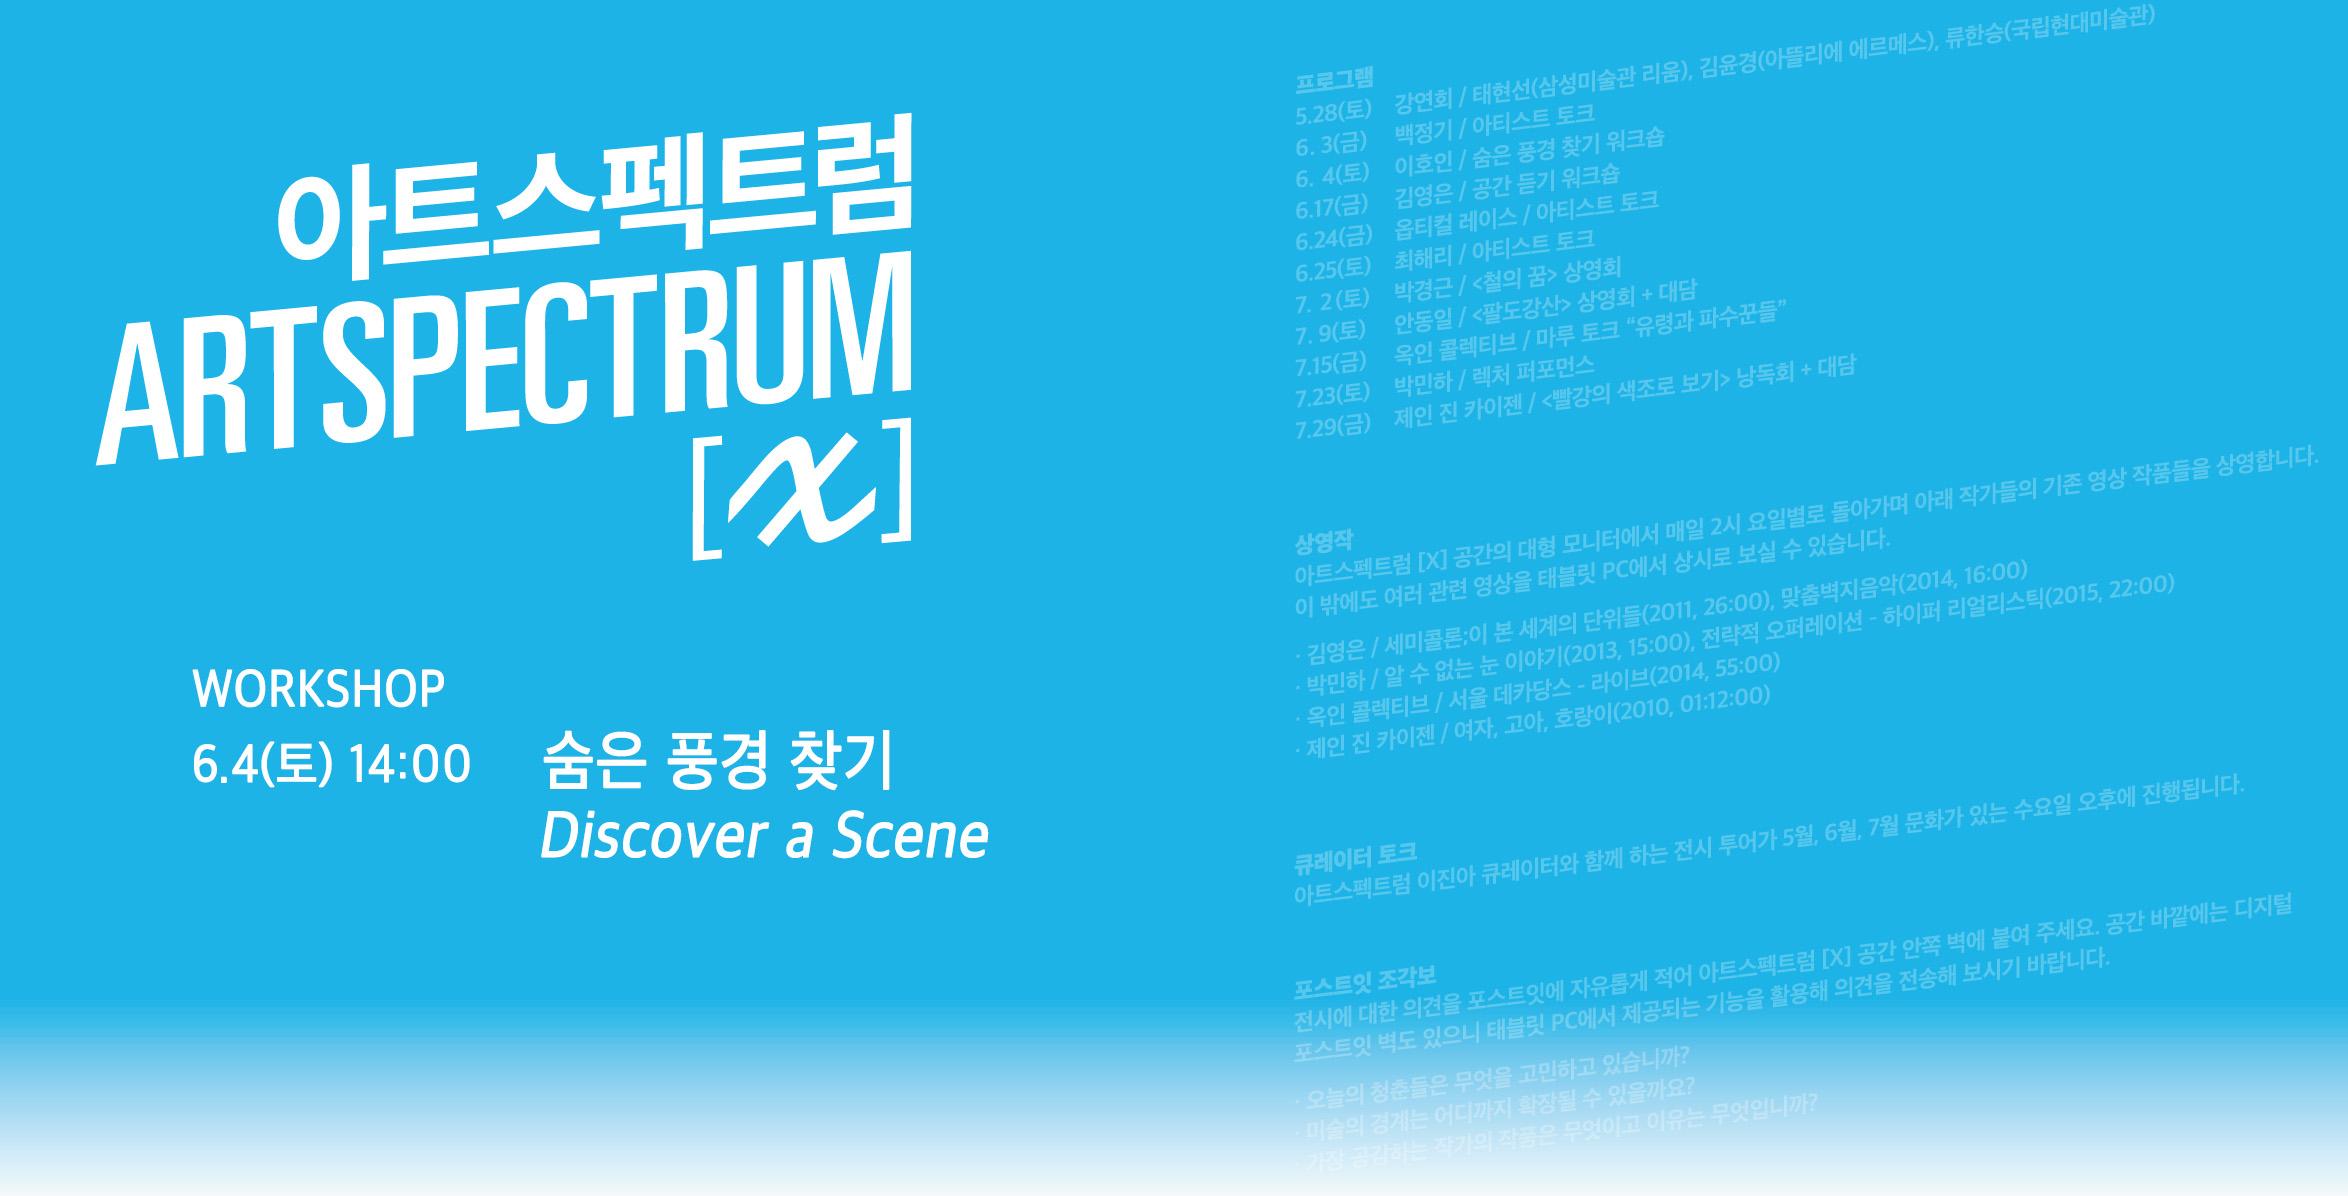 ARTSPECTRUM [X] 숨은 풍경 찾기 워크숍 6.4(토) 14:00